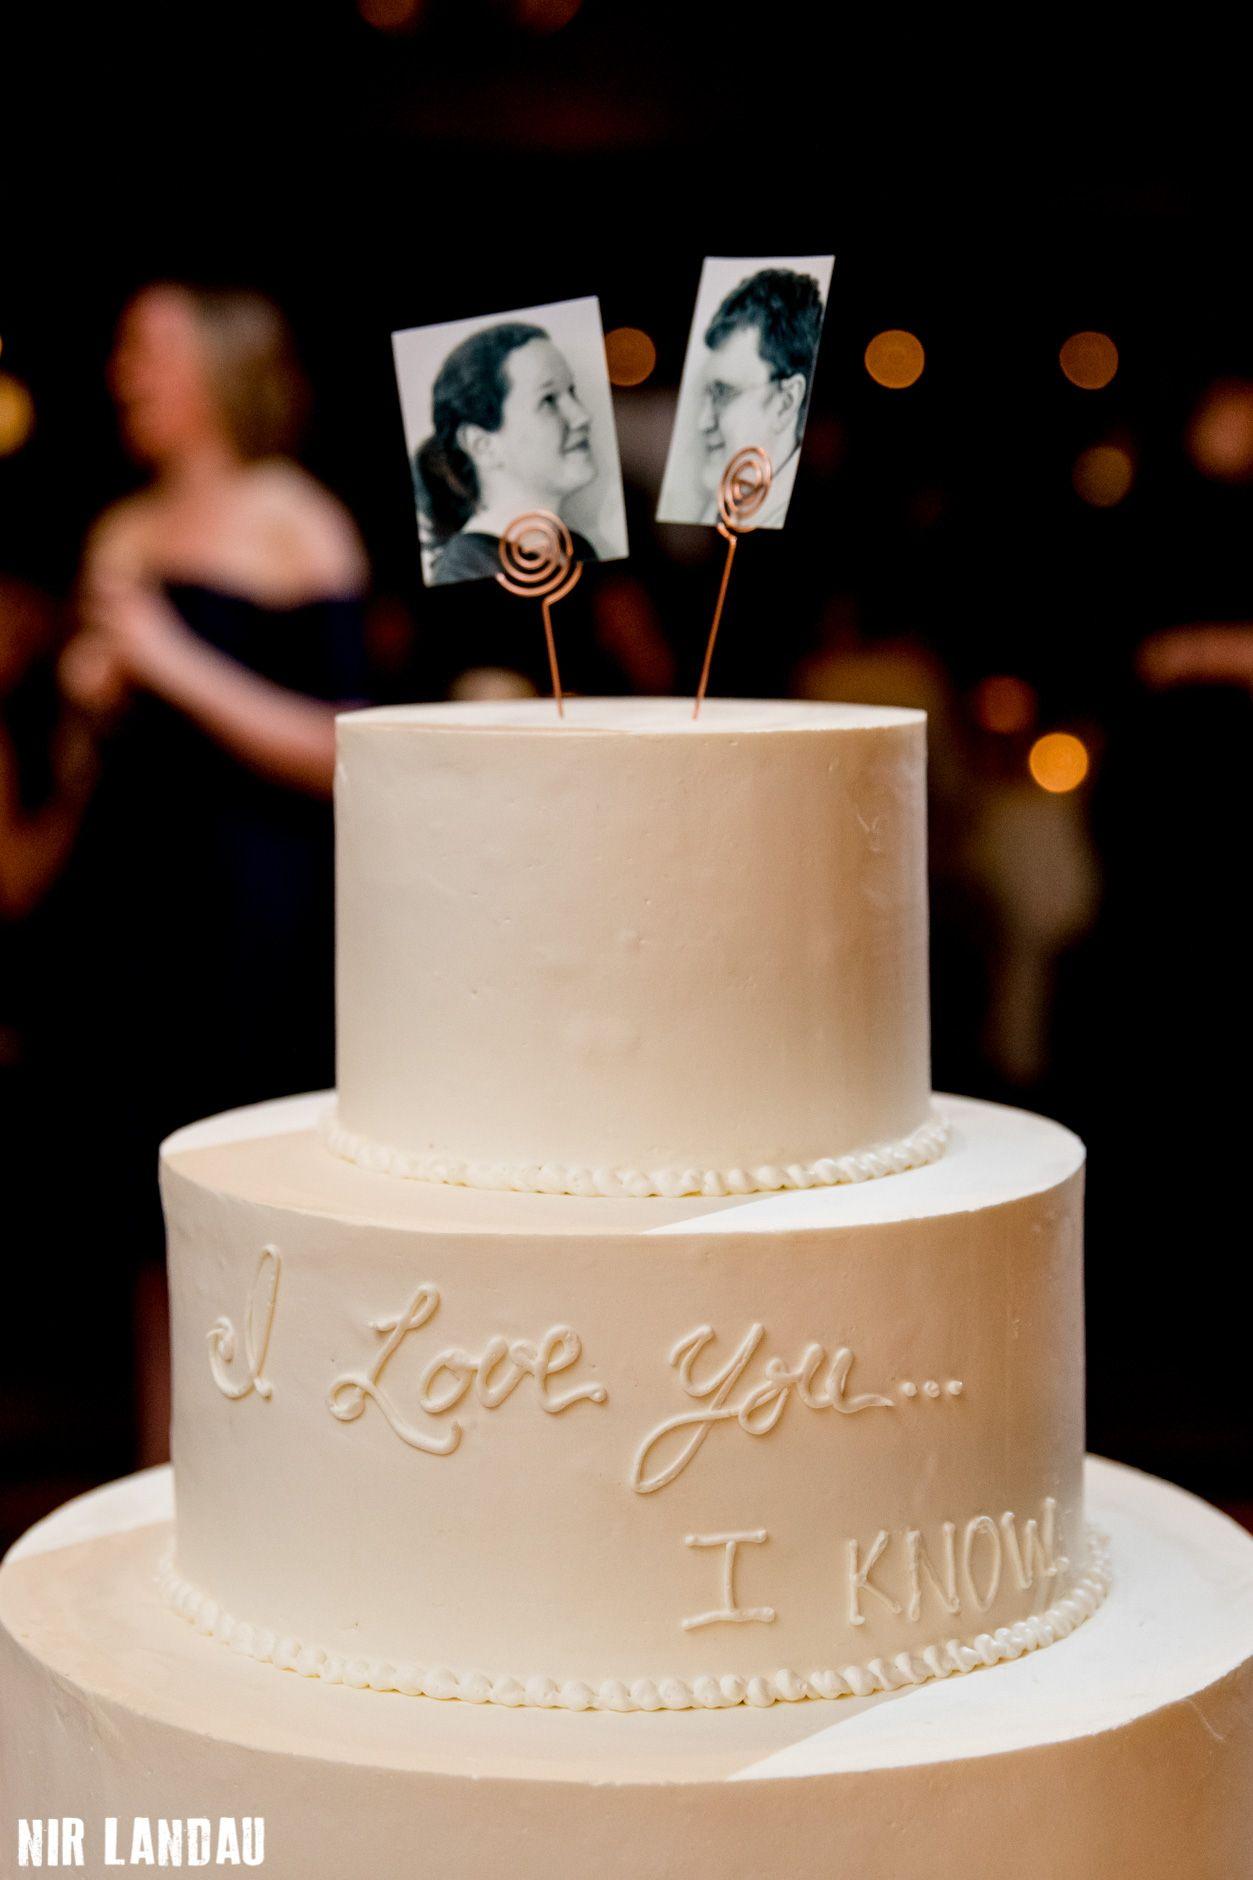 Star Wars Quote Wedding Cake Simple White 3 Tier Wedding Cake With Bride And Groom Pho Wedding Cake Quotes Wedding Cake Fresh Flowers Star Wars Wedding Cake